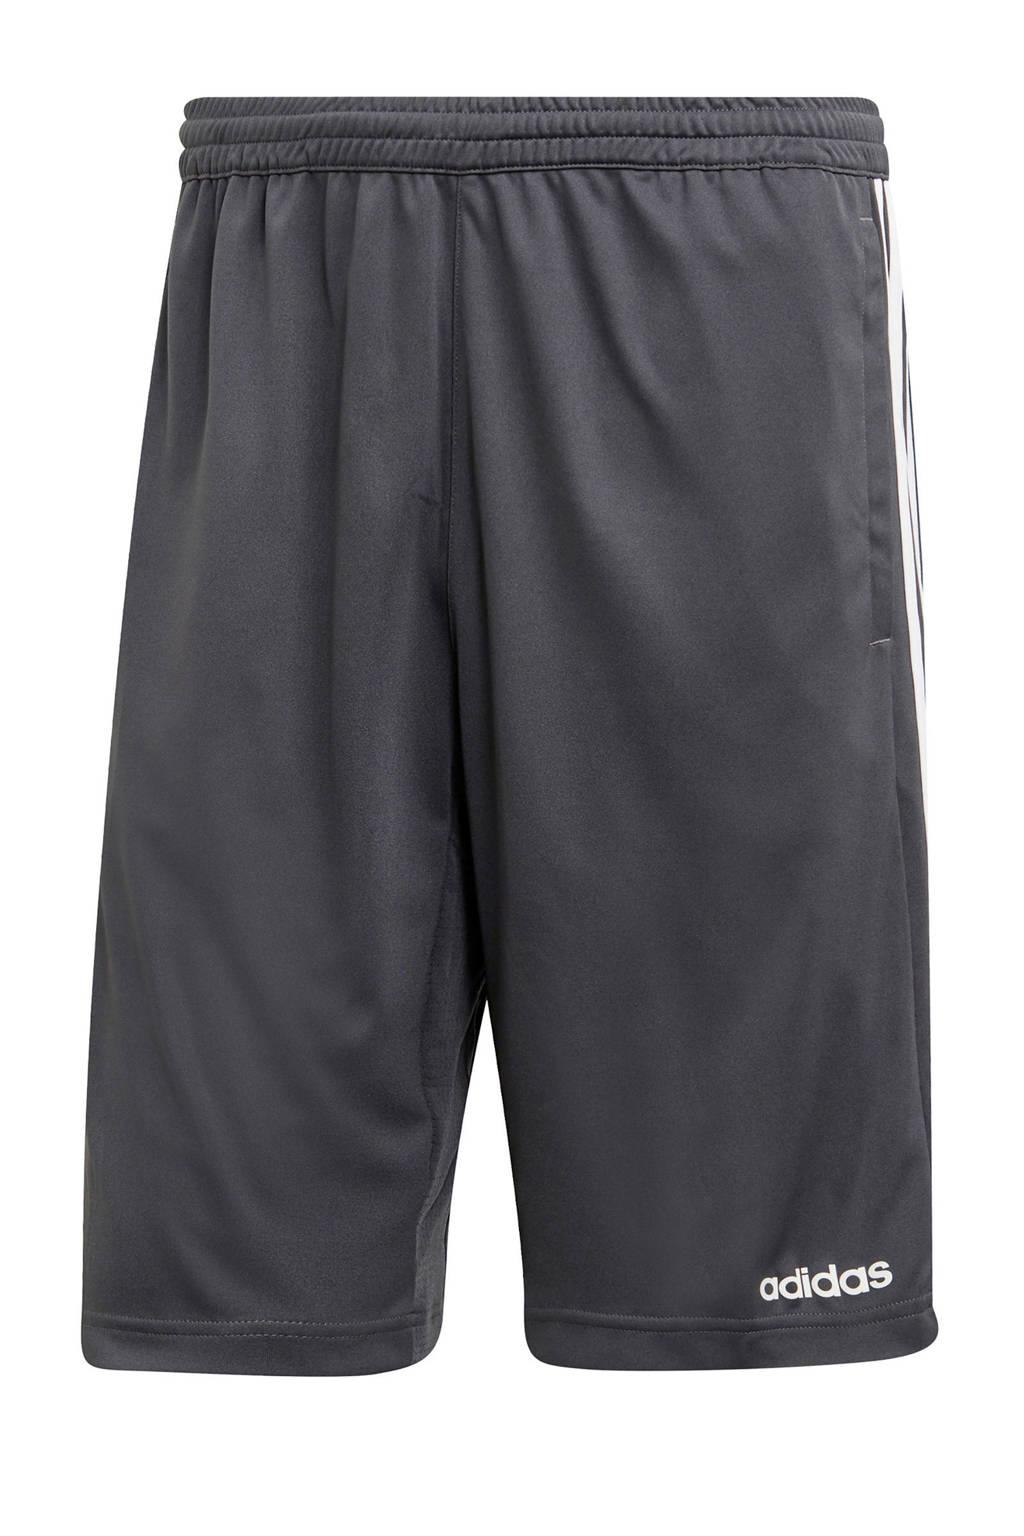 adidas Performance   sportshort grijs, Grijs/wit